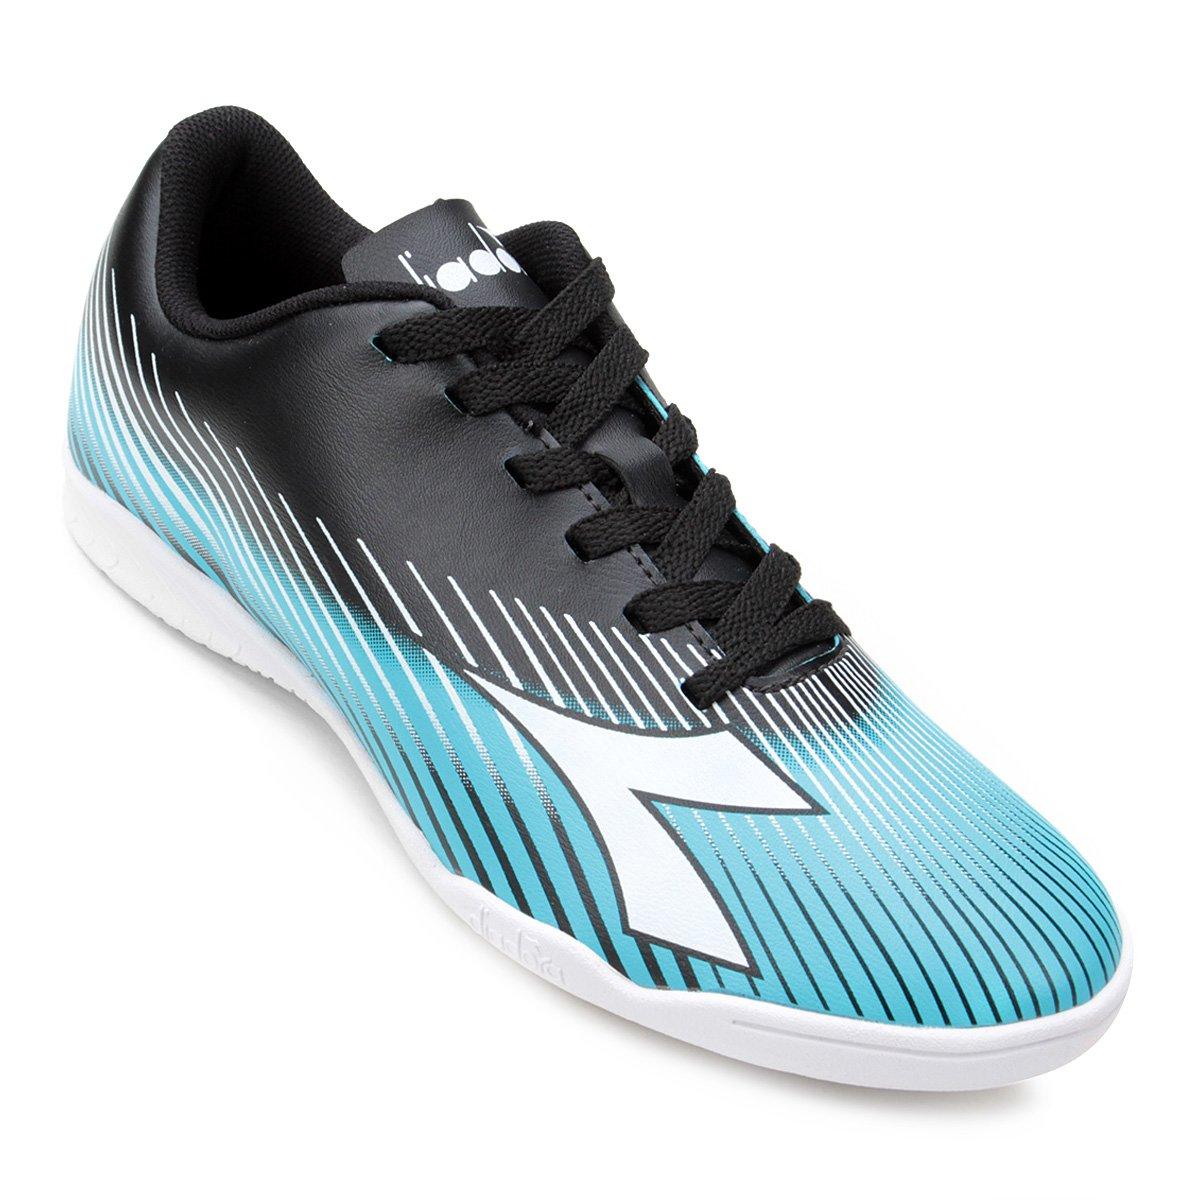 Chuteira Futsal Diadora Rules - Preto e Azul - Compre Agora  db5910b42f0f9